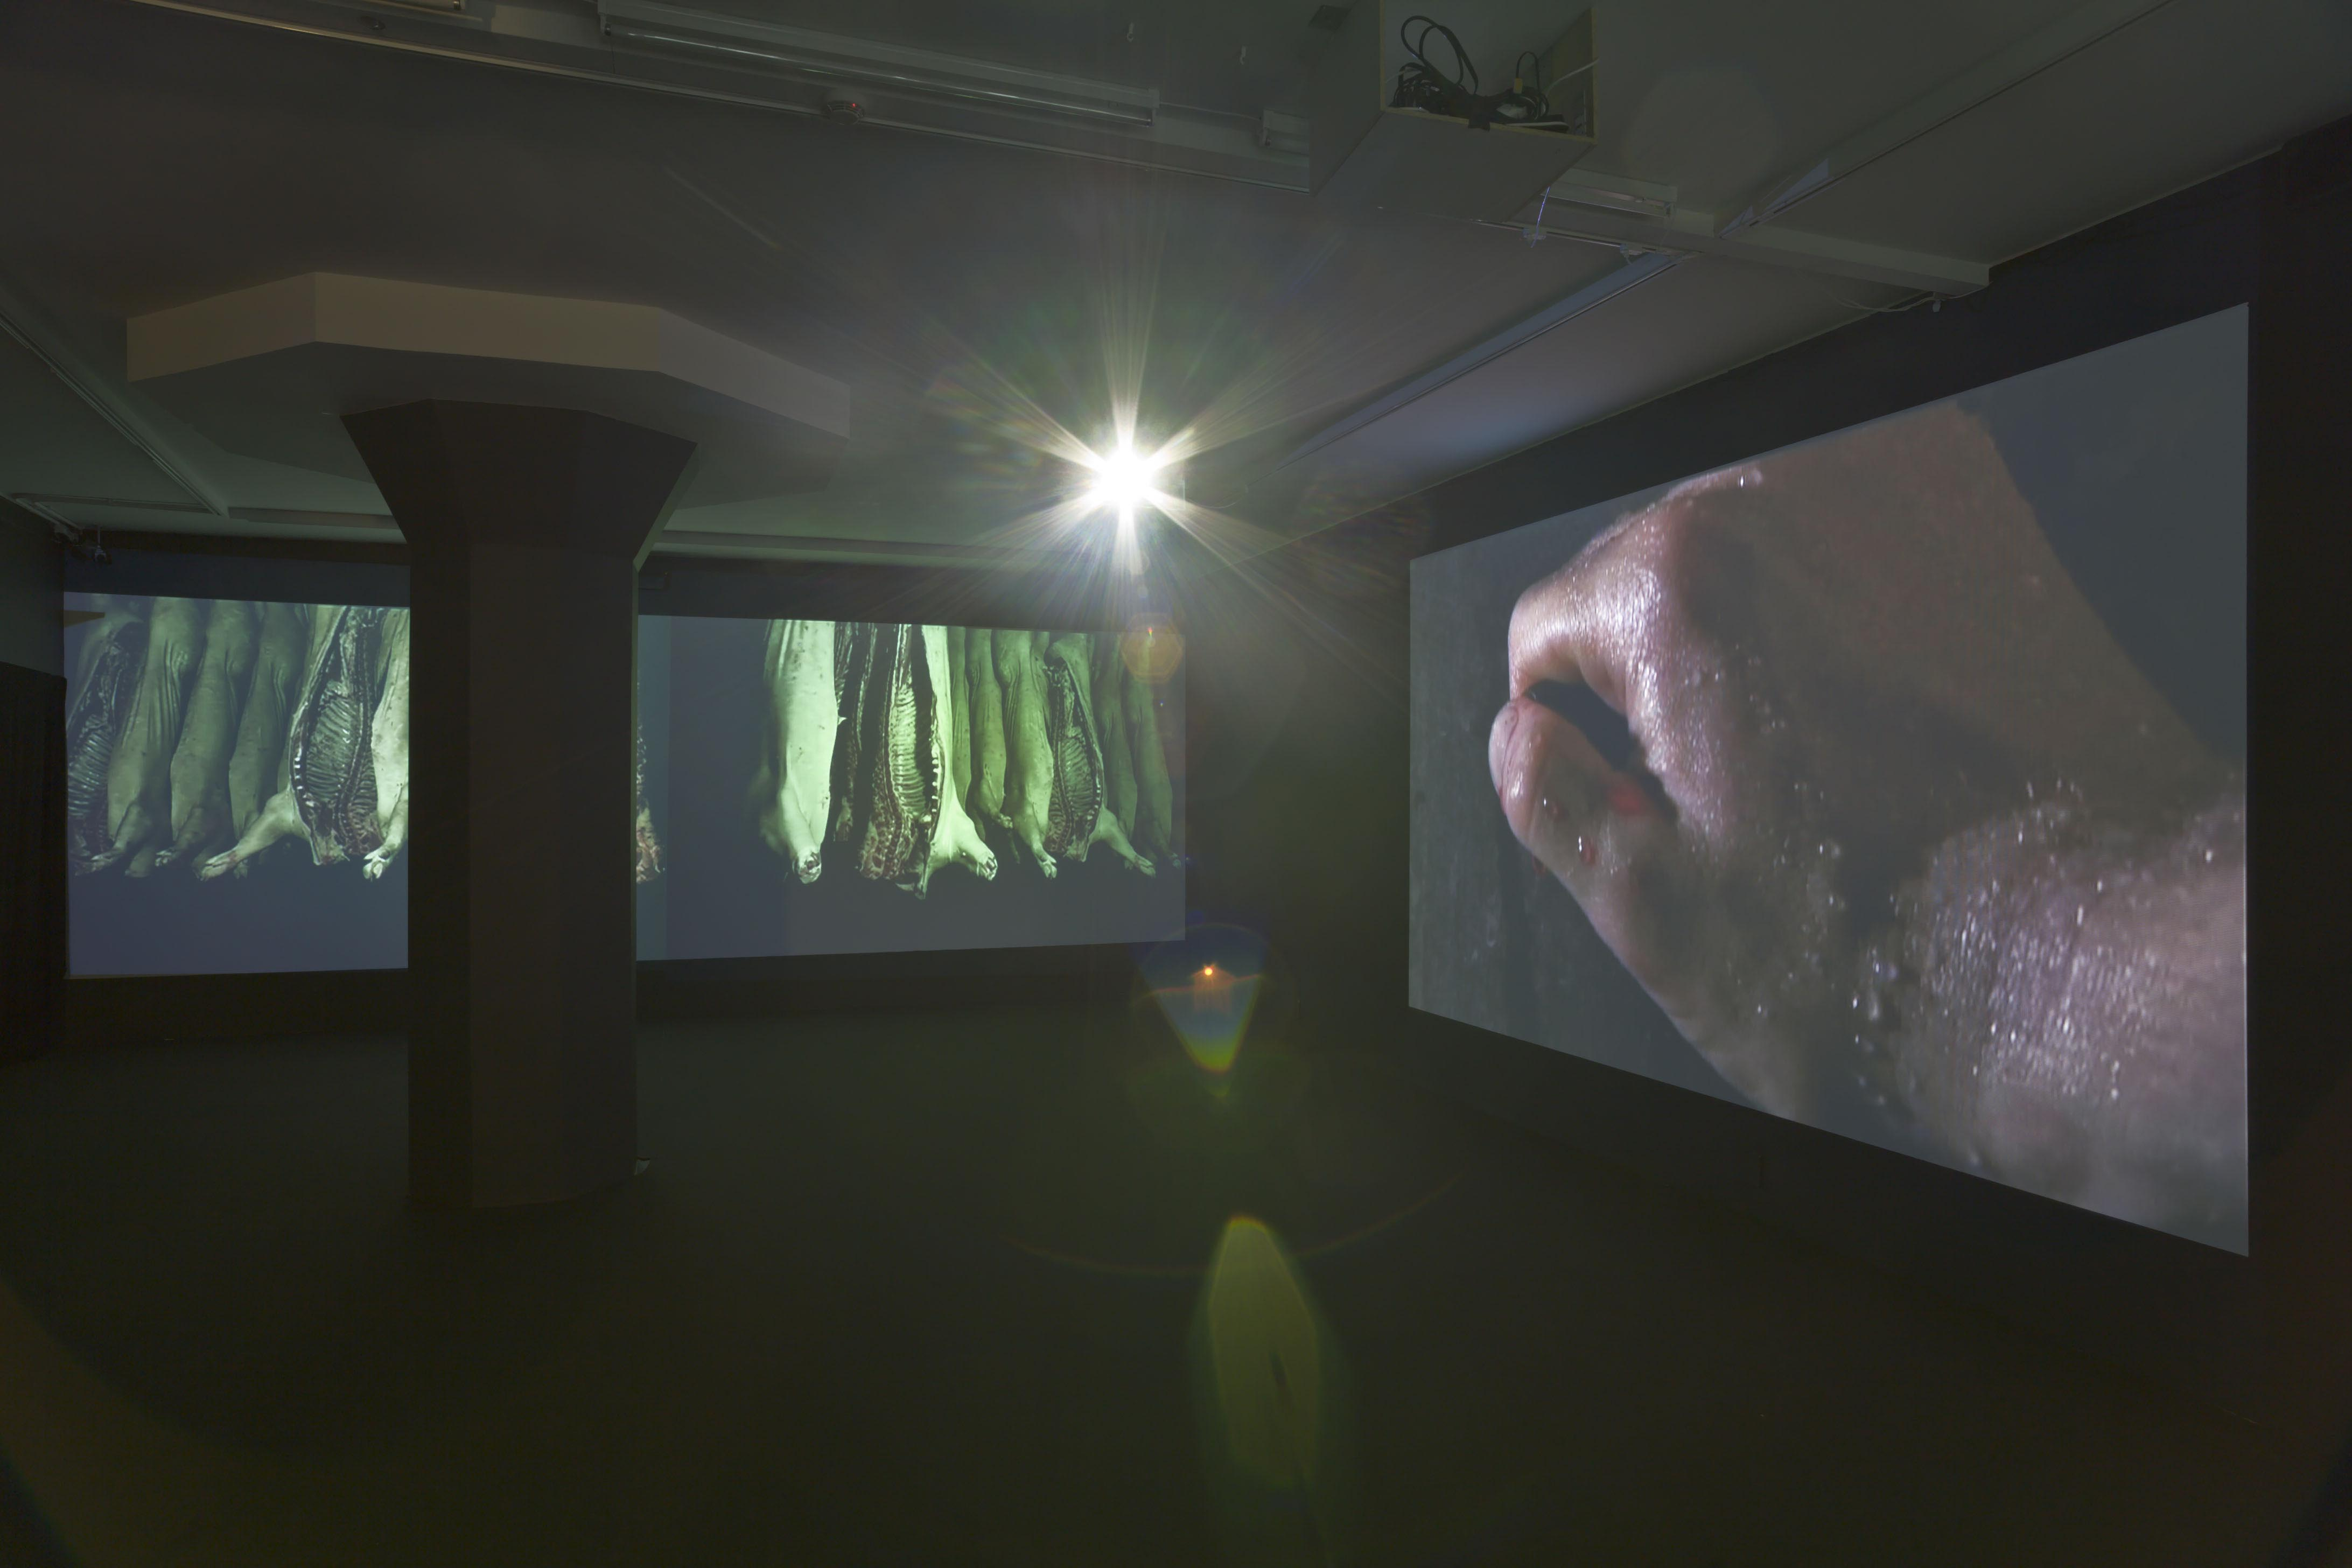 sigurdur gudjonsson_Breed_Reykjavík Art Museum 1